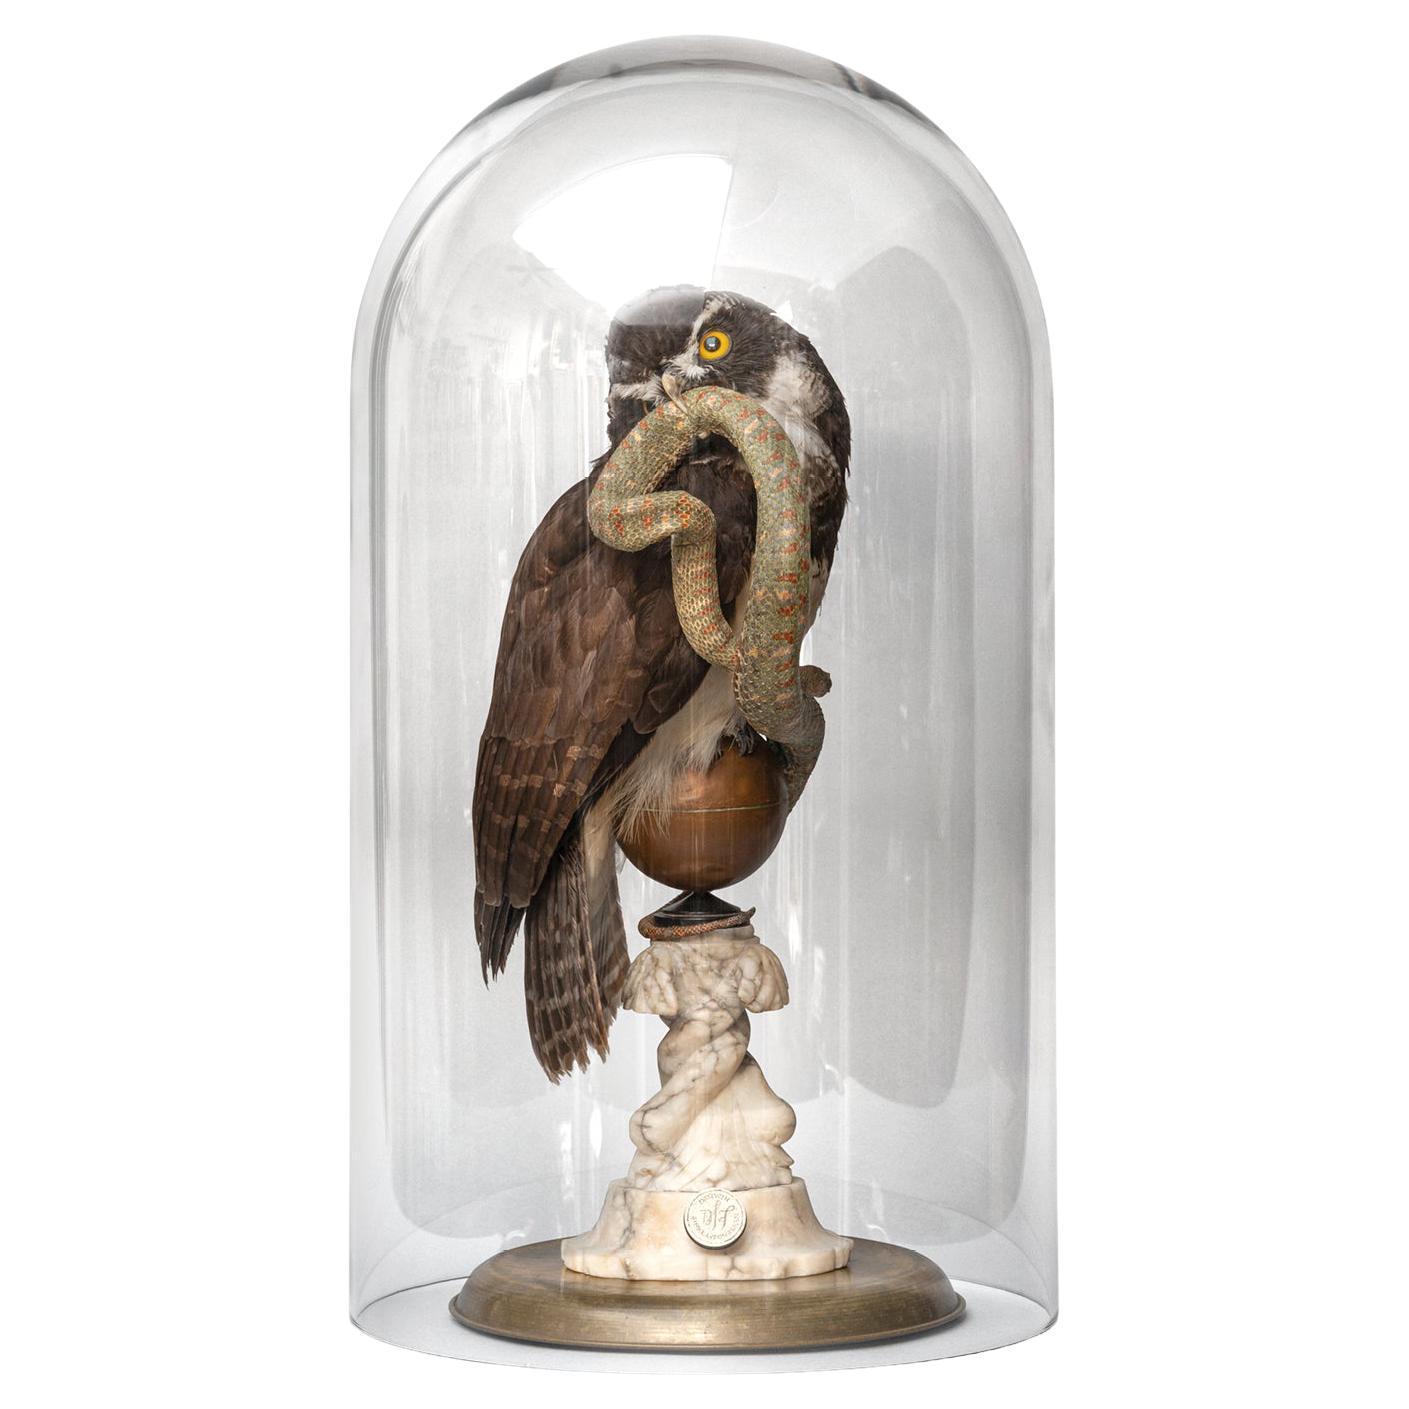 Fine Taxidermy The Spectacled Owl & Snake by Sinke & Van Tongeren